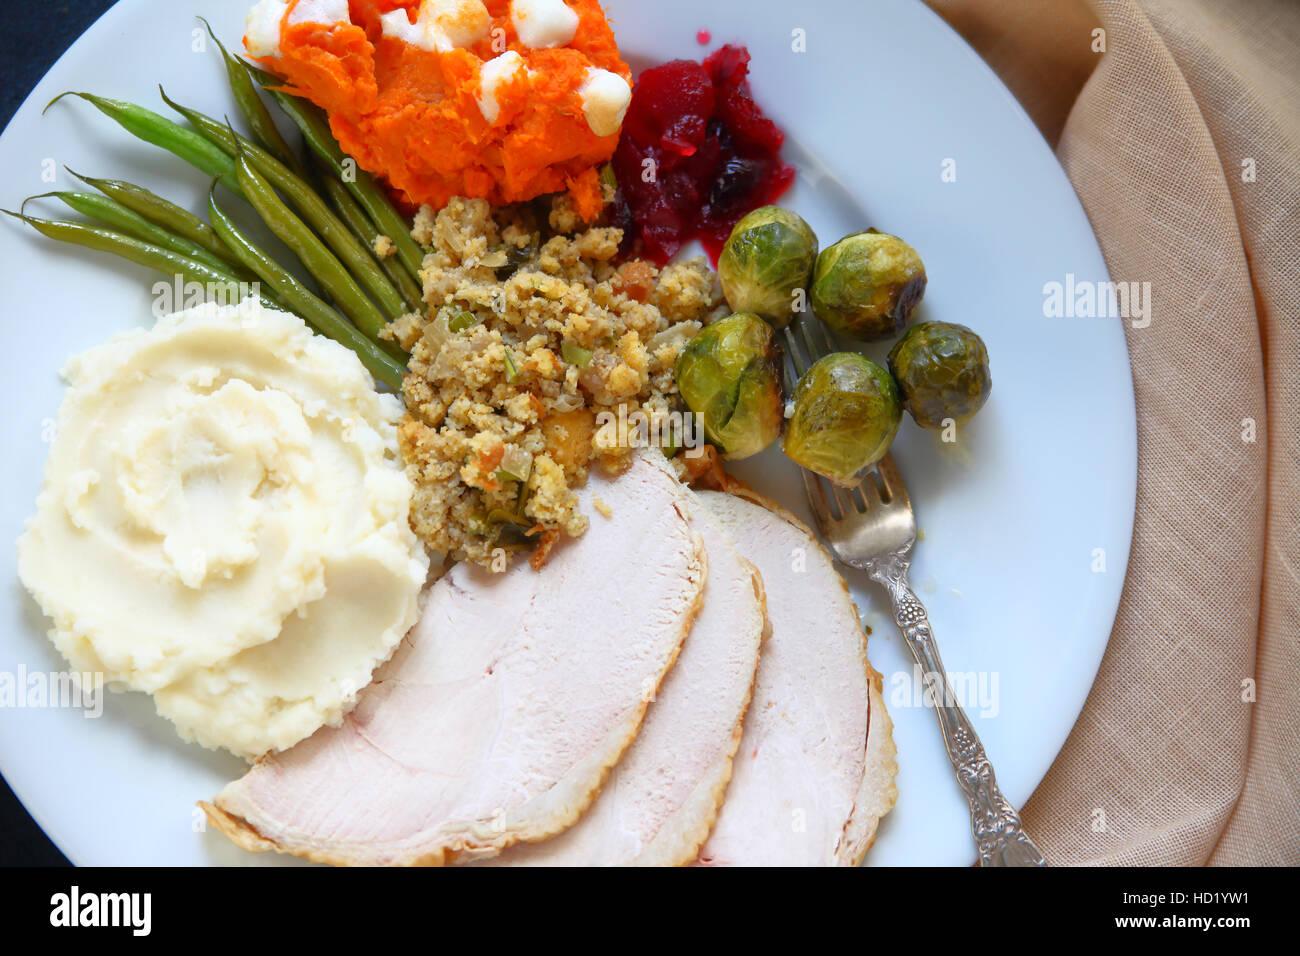 Thanksgiving Dinner Stockfotos & Thanksgiving Dinner Bilder - Alamy